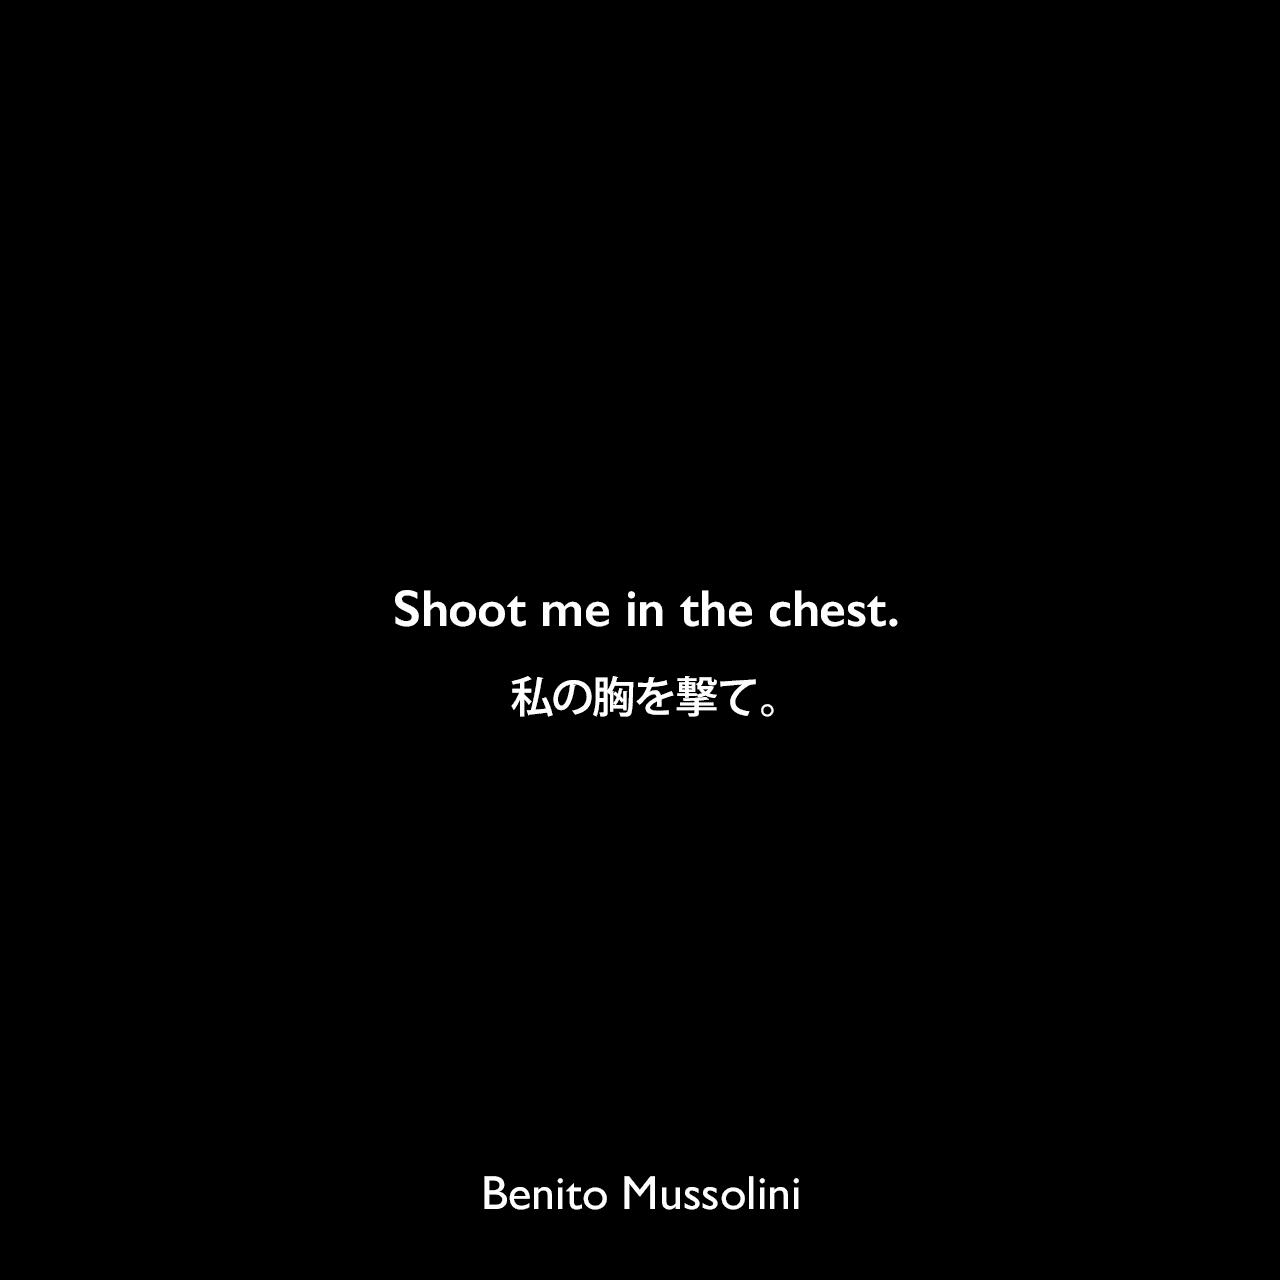 Shoot me in the chest.私の胸を撃て。- 1945年4月28日ムッソリーニの最後の言葉Benito Mussolini